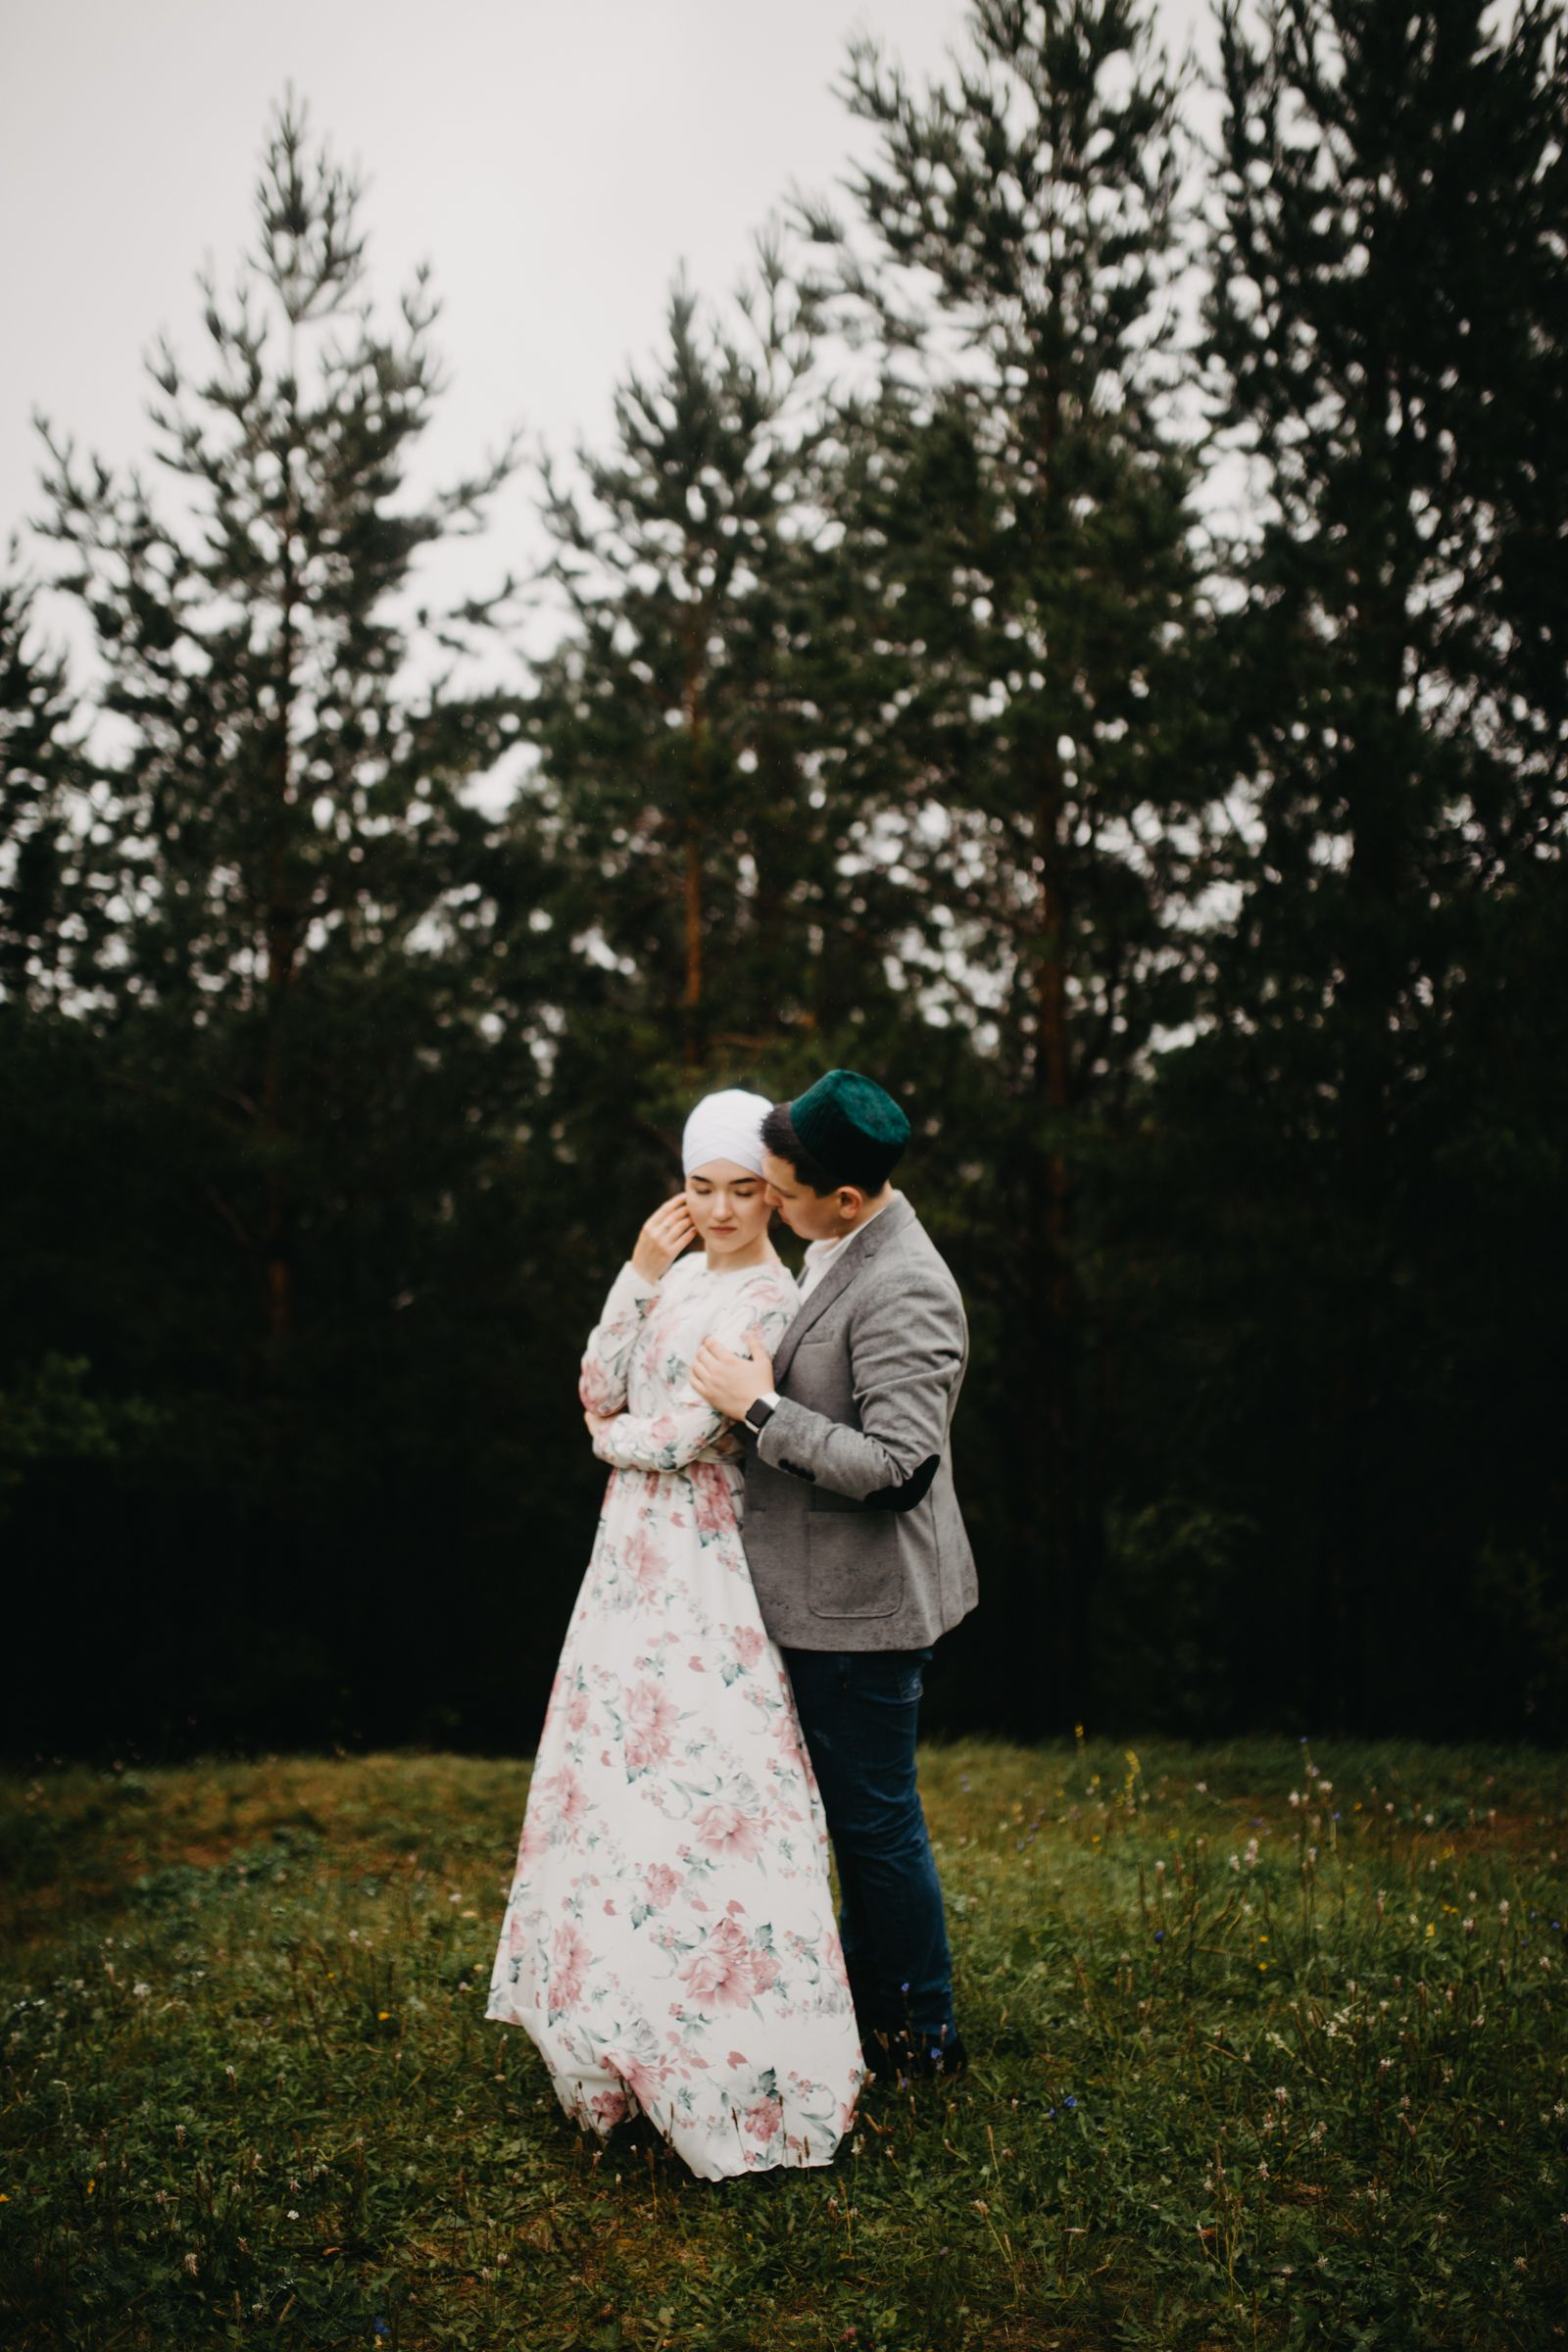 Фотосессия пары love story wedding day никах образ на ...